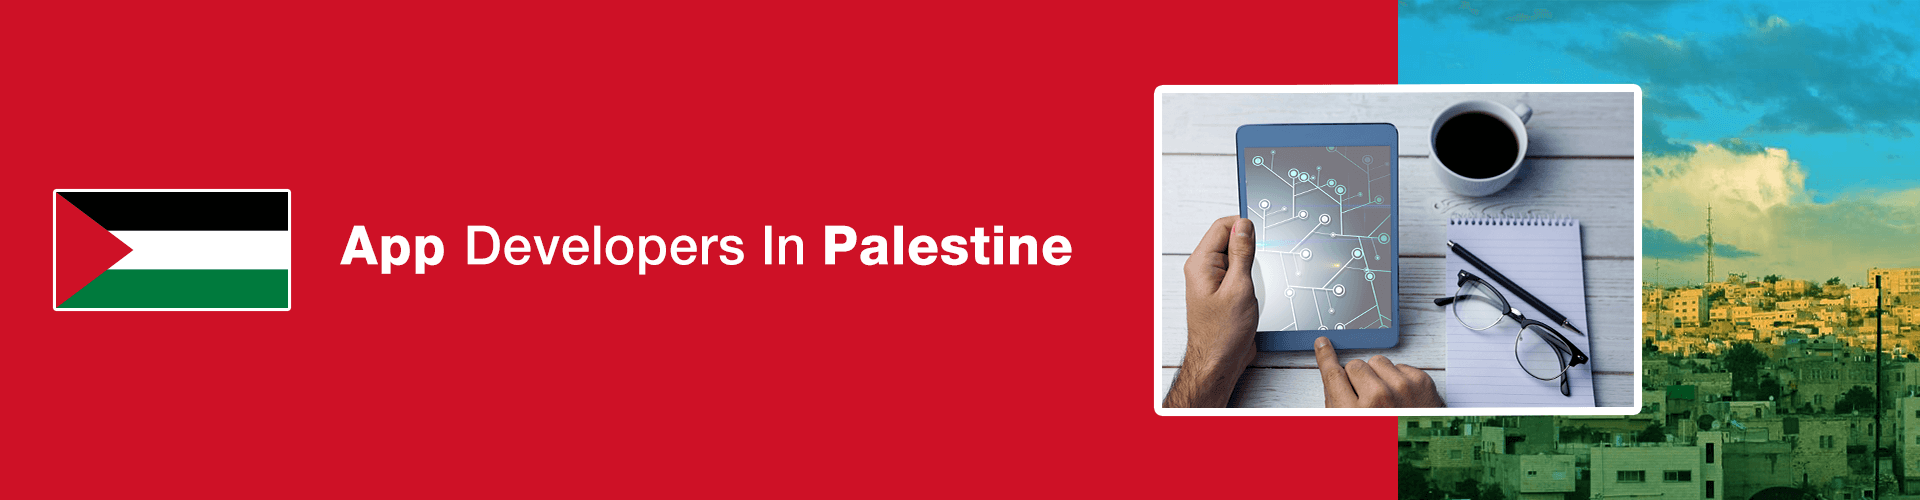 mobile app development palestine